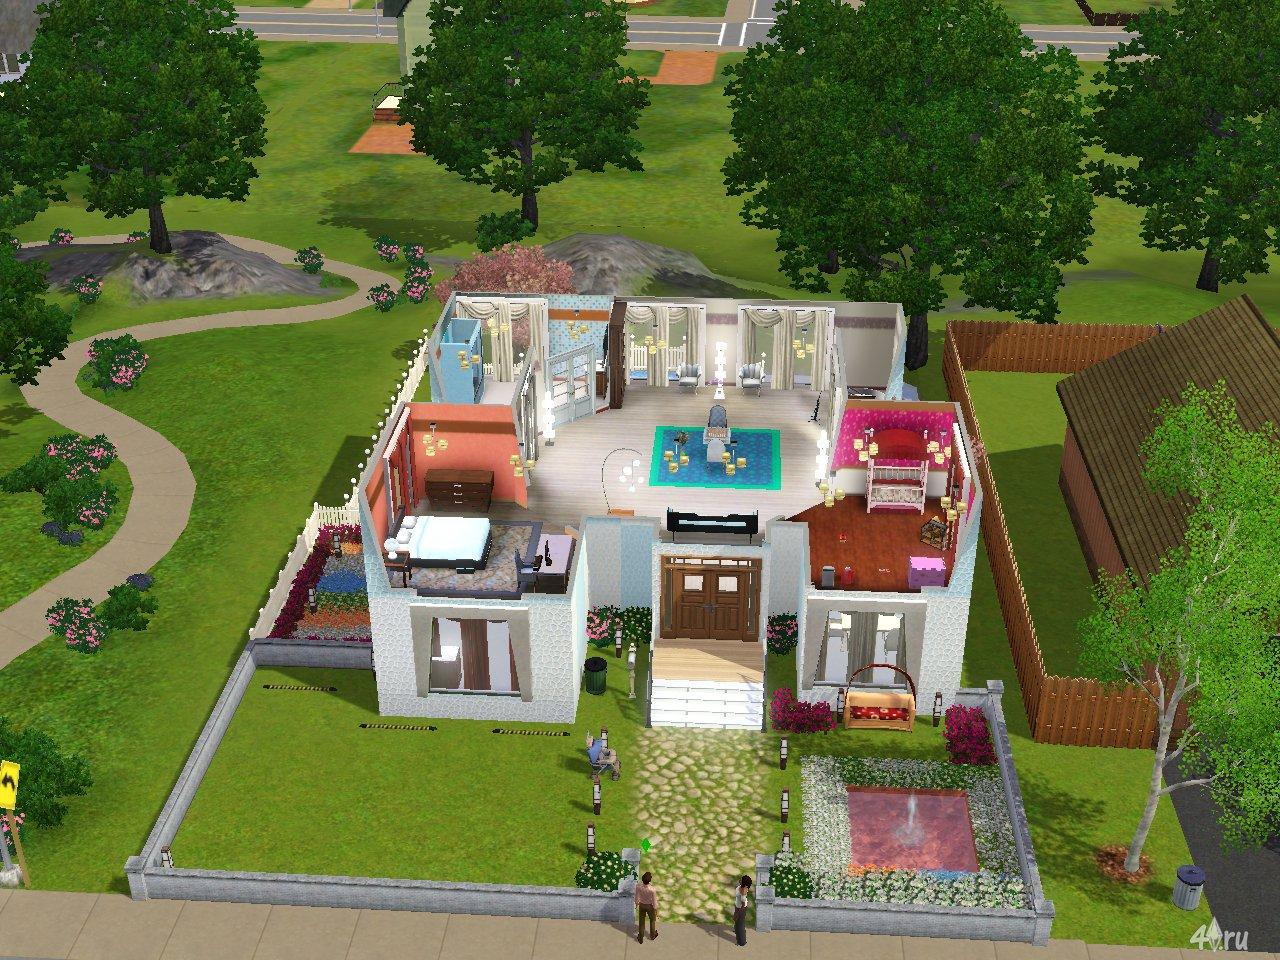 Схема домов в симс 3 фото внутри и снаружи